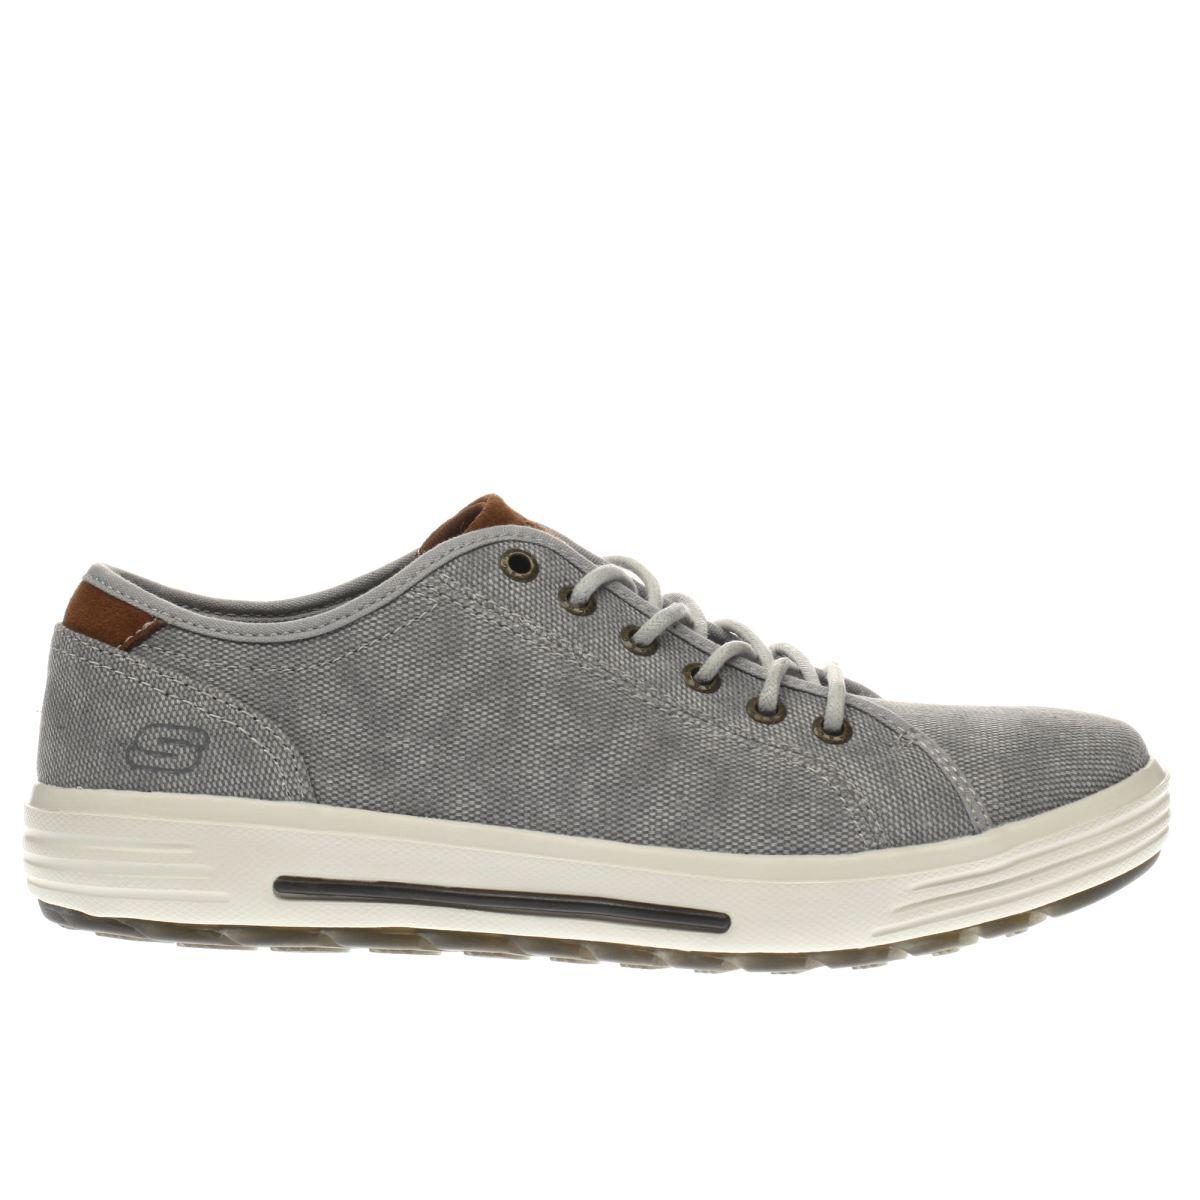 skechers light grey porter trainers